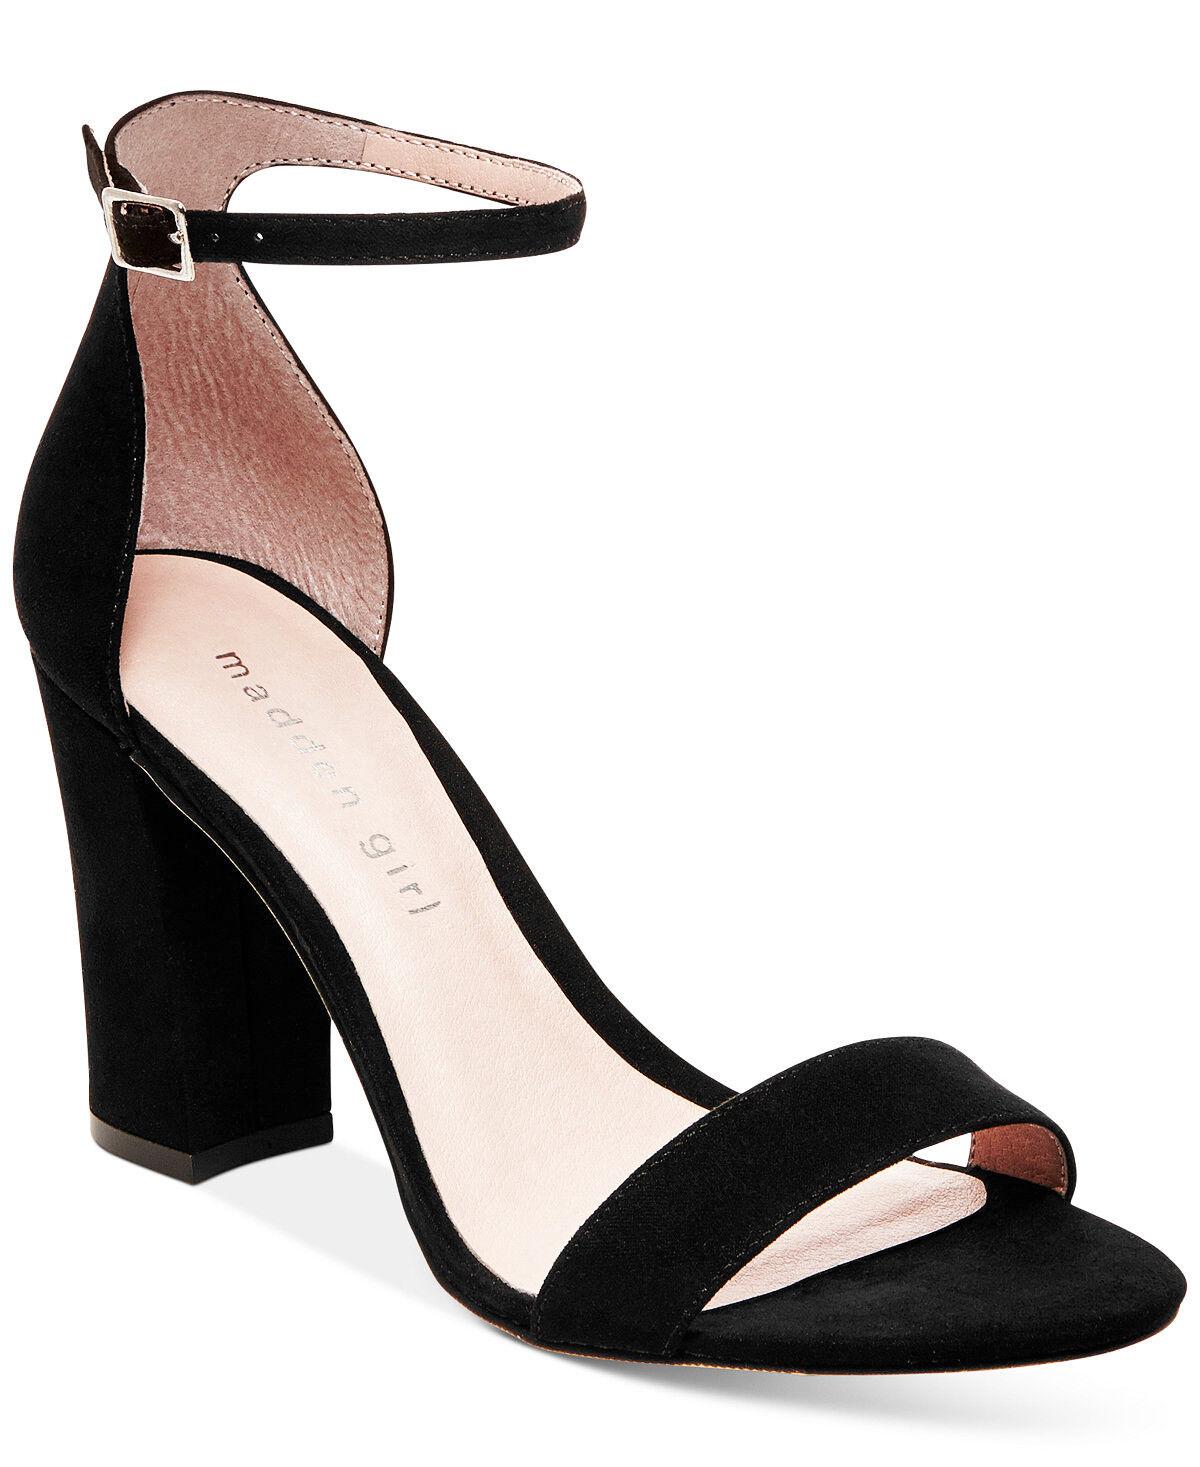 Madden Girl Beella Block Heel Sandals Black Fabric shoes Size 8